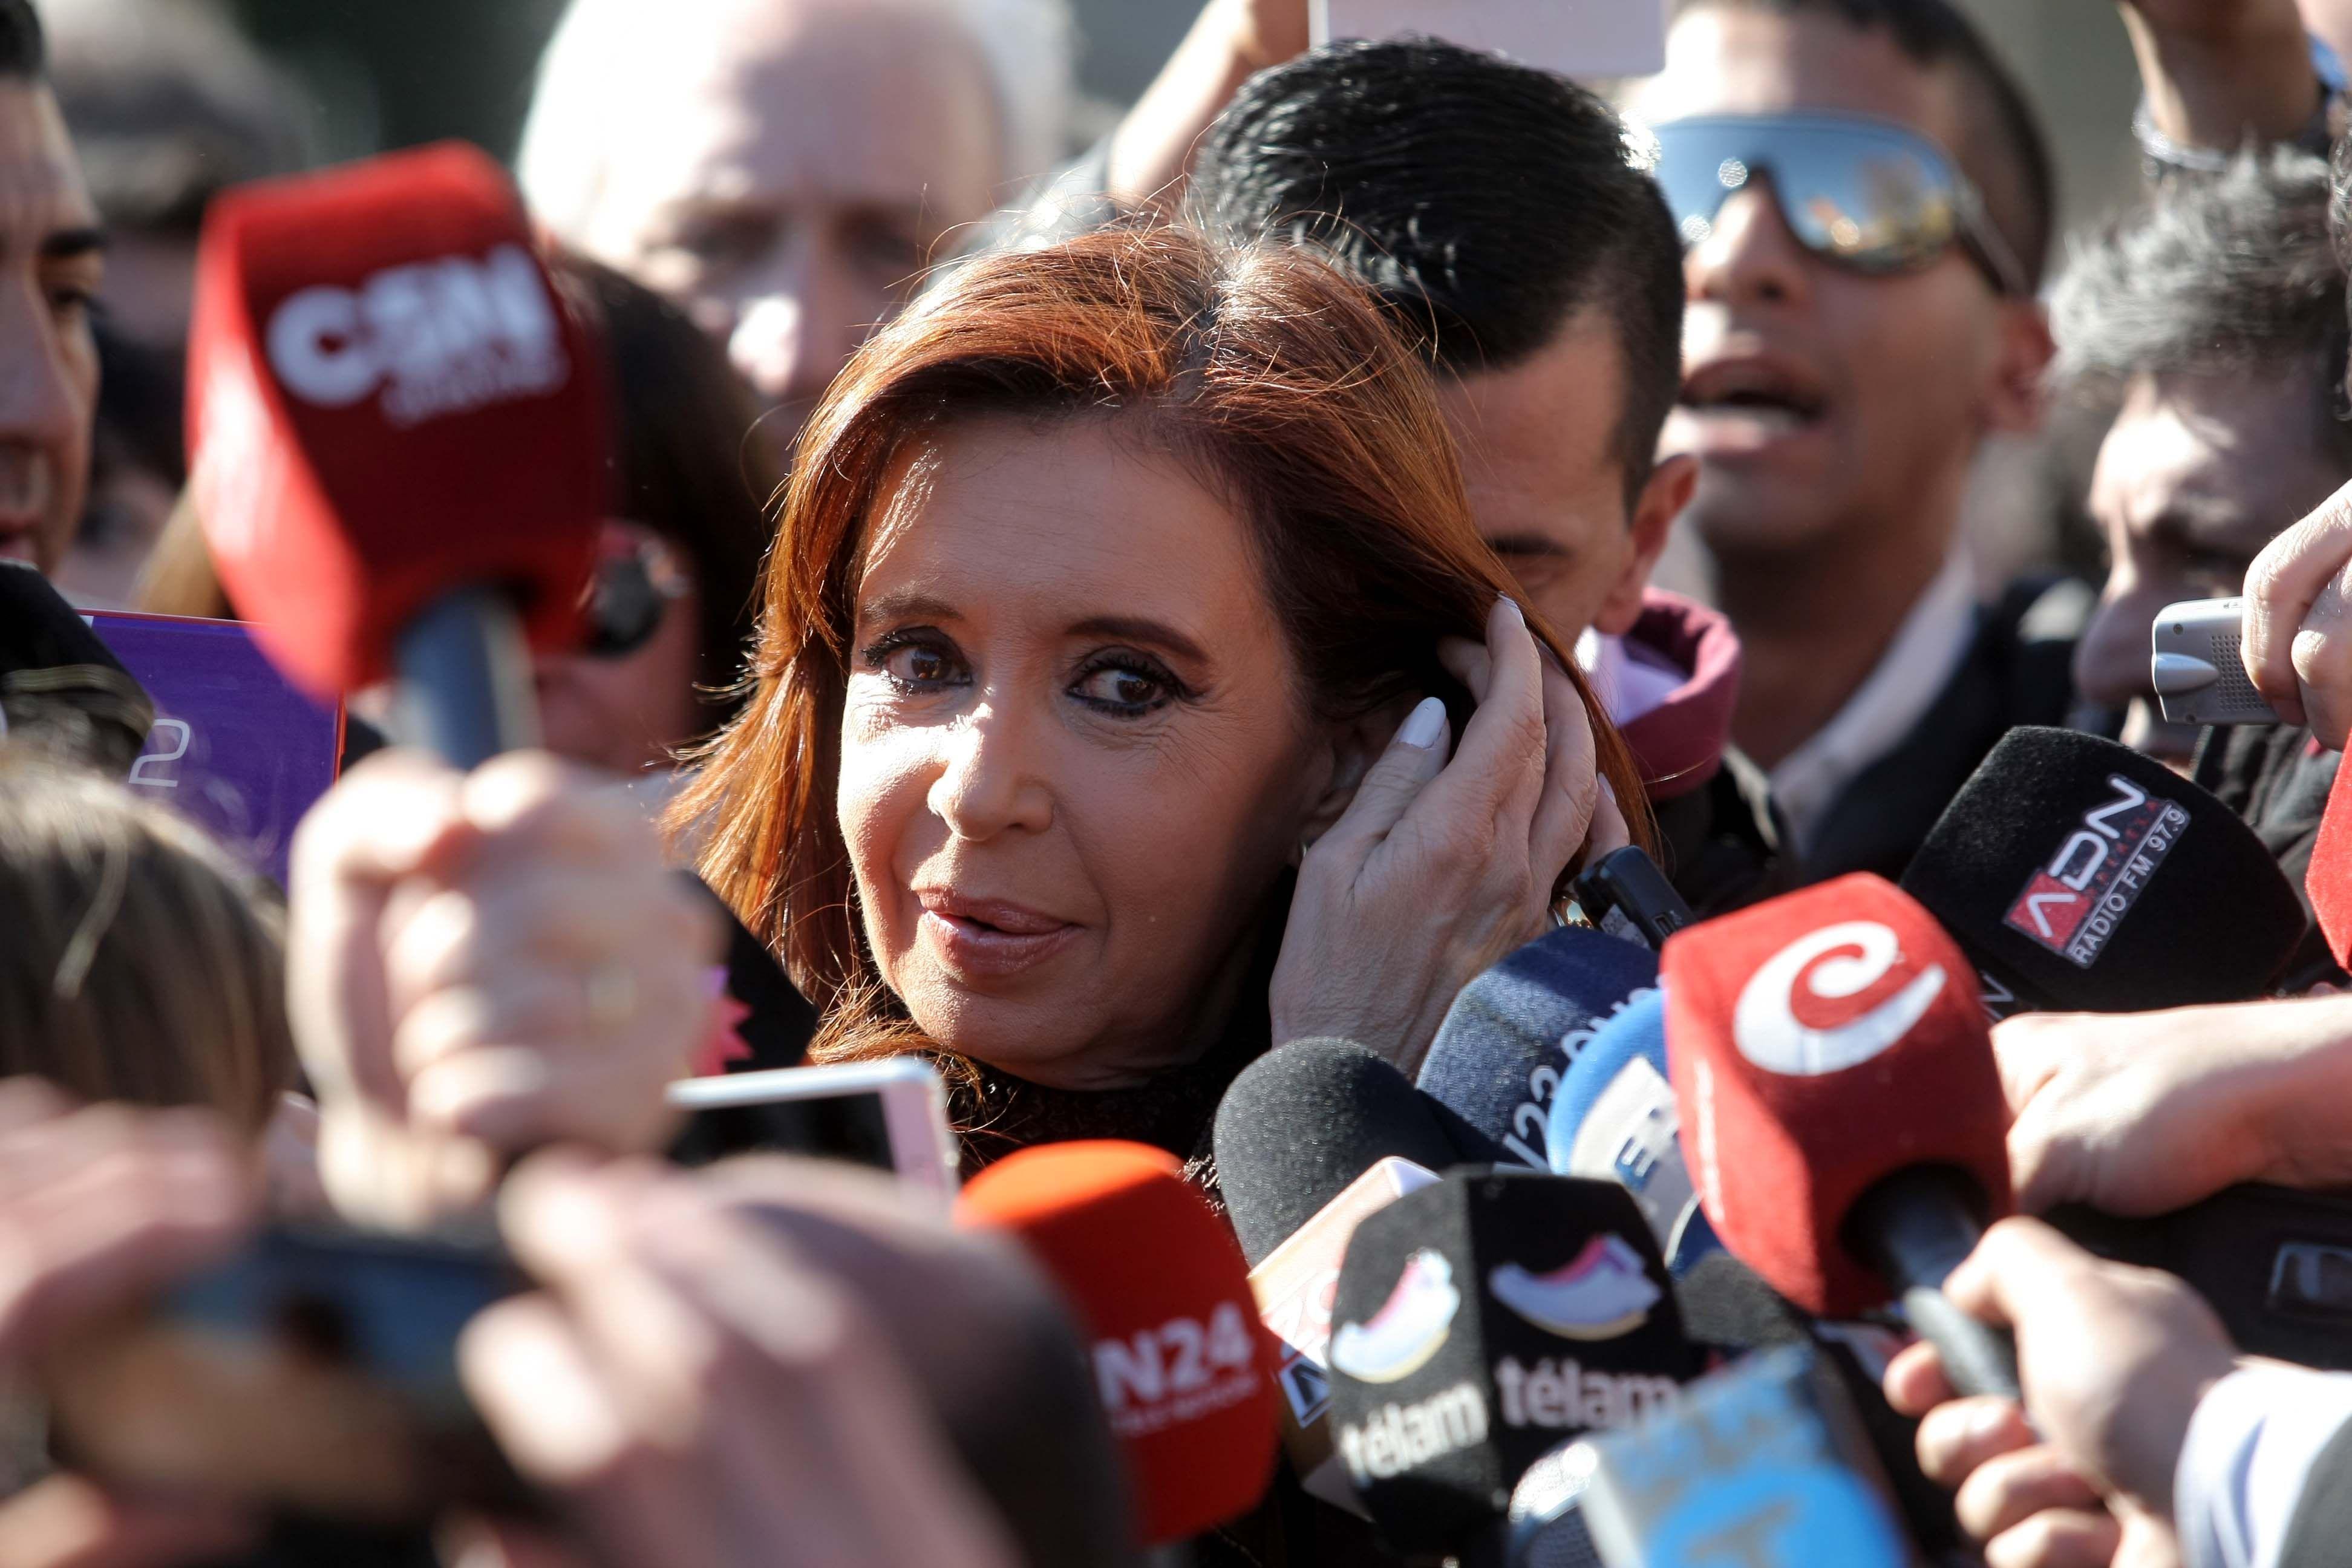 Stolbizer sumó dos veces el dinero de la caja de seguridad, explicó Cristina Kirchner